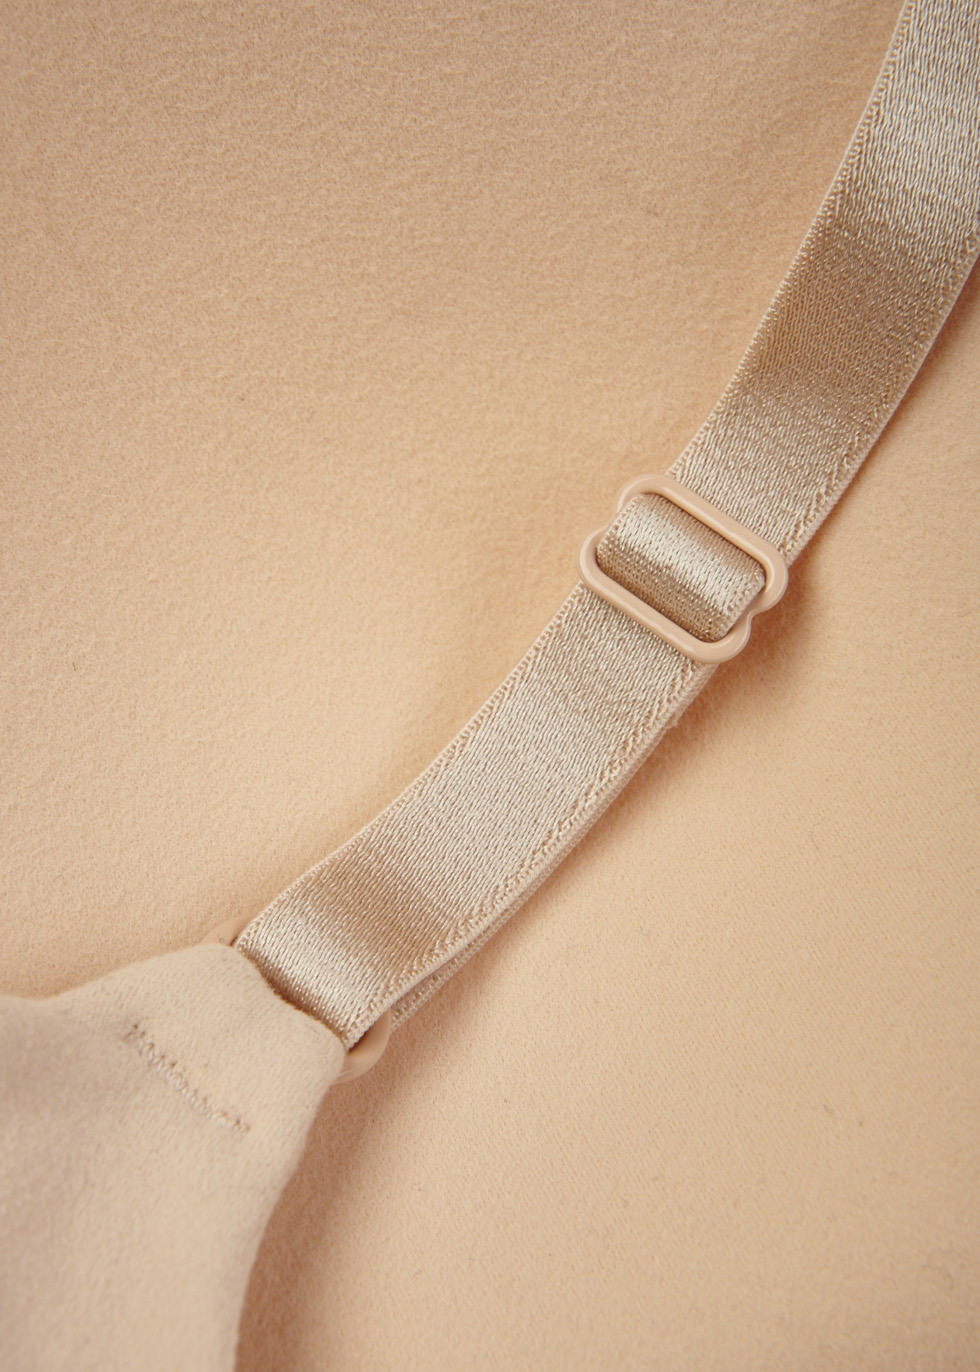 How Perfect blush contour bra - Wacoal